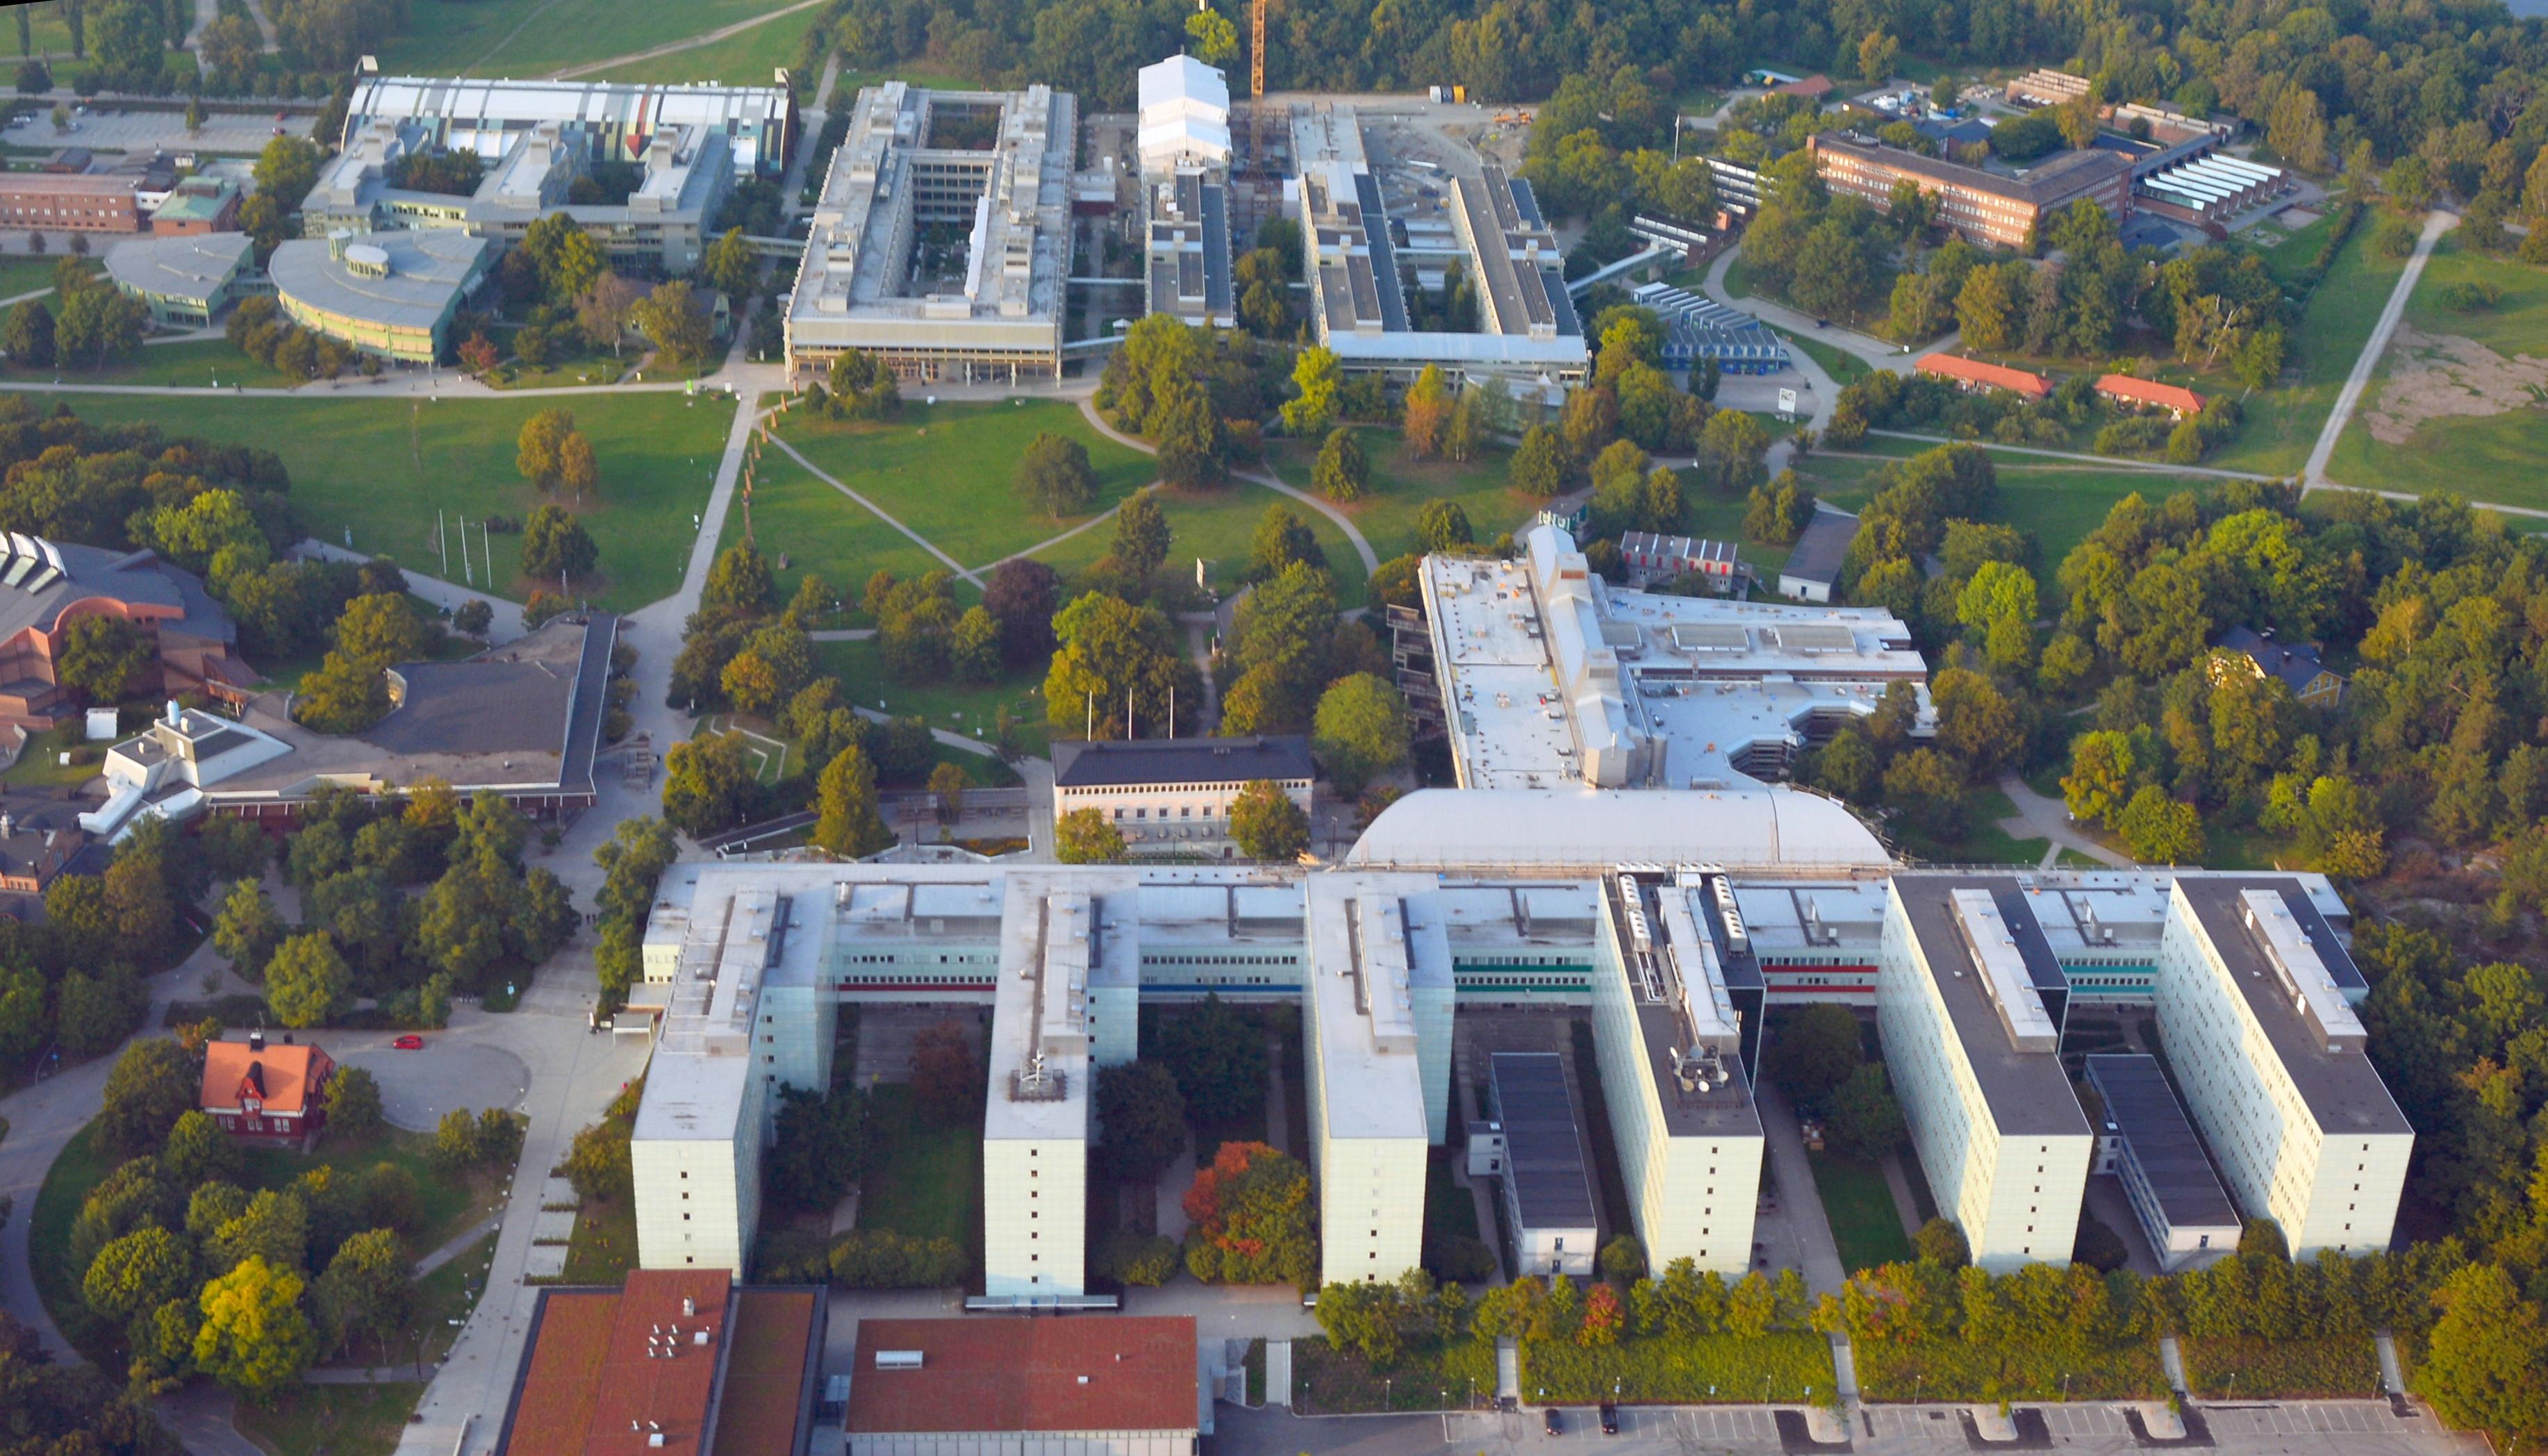 Filestockholms Universitet Flygfoto  Jpg